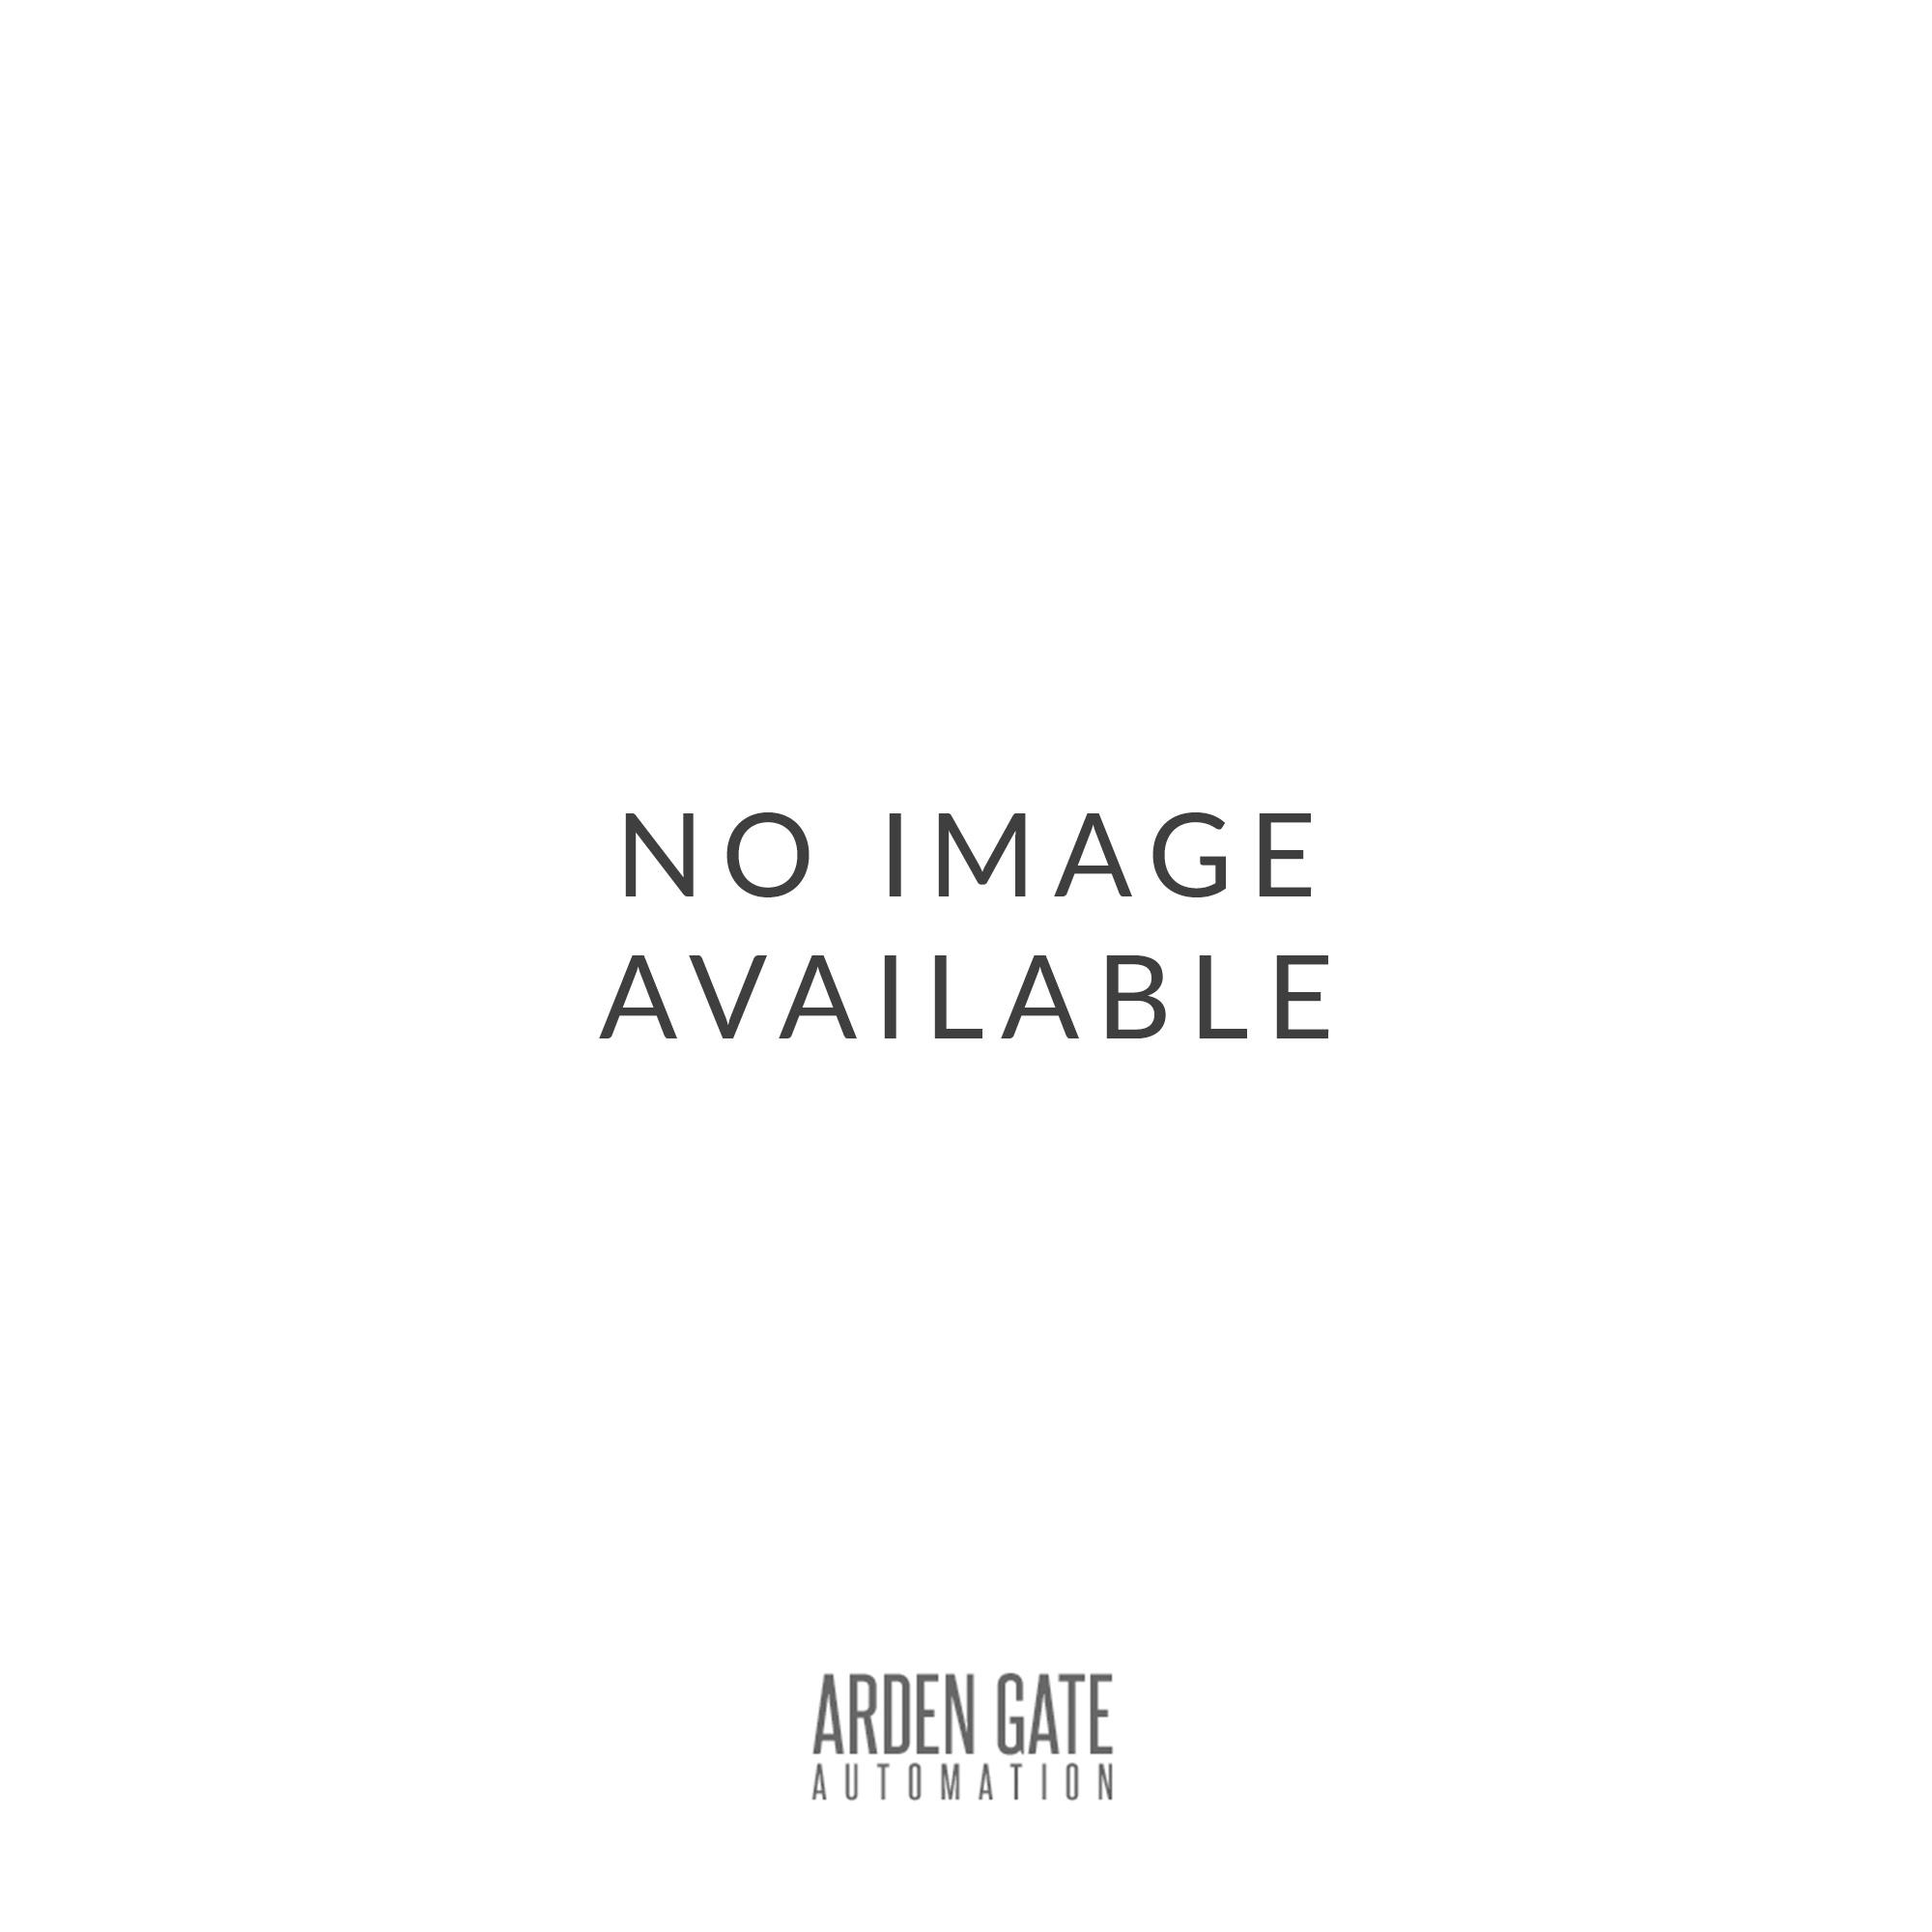 STOPPY 700 MBB 700 x 220 Electromechanical Automatic Bollard c/w LED light crown